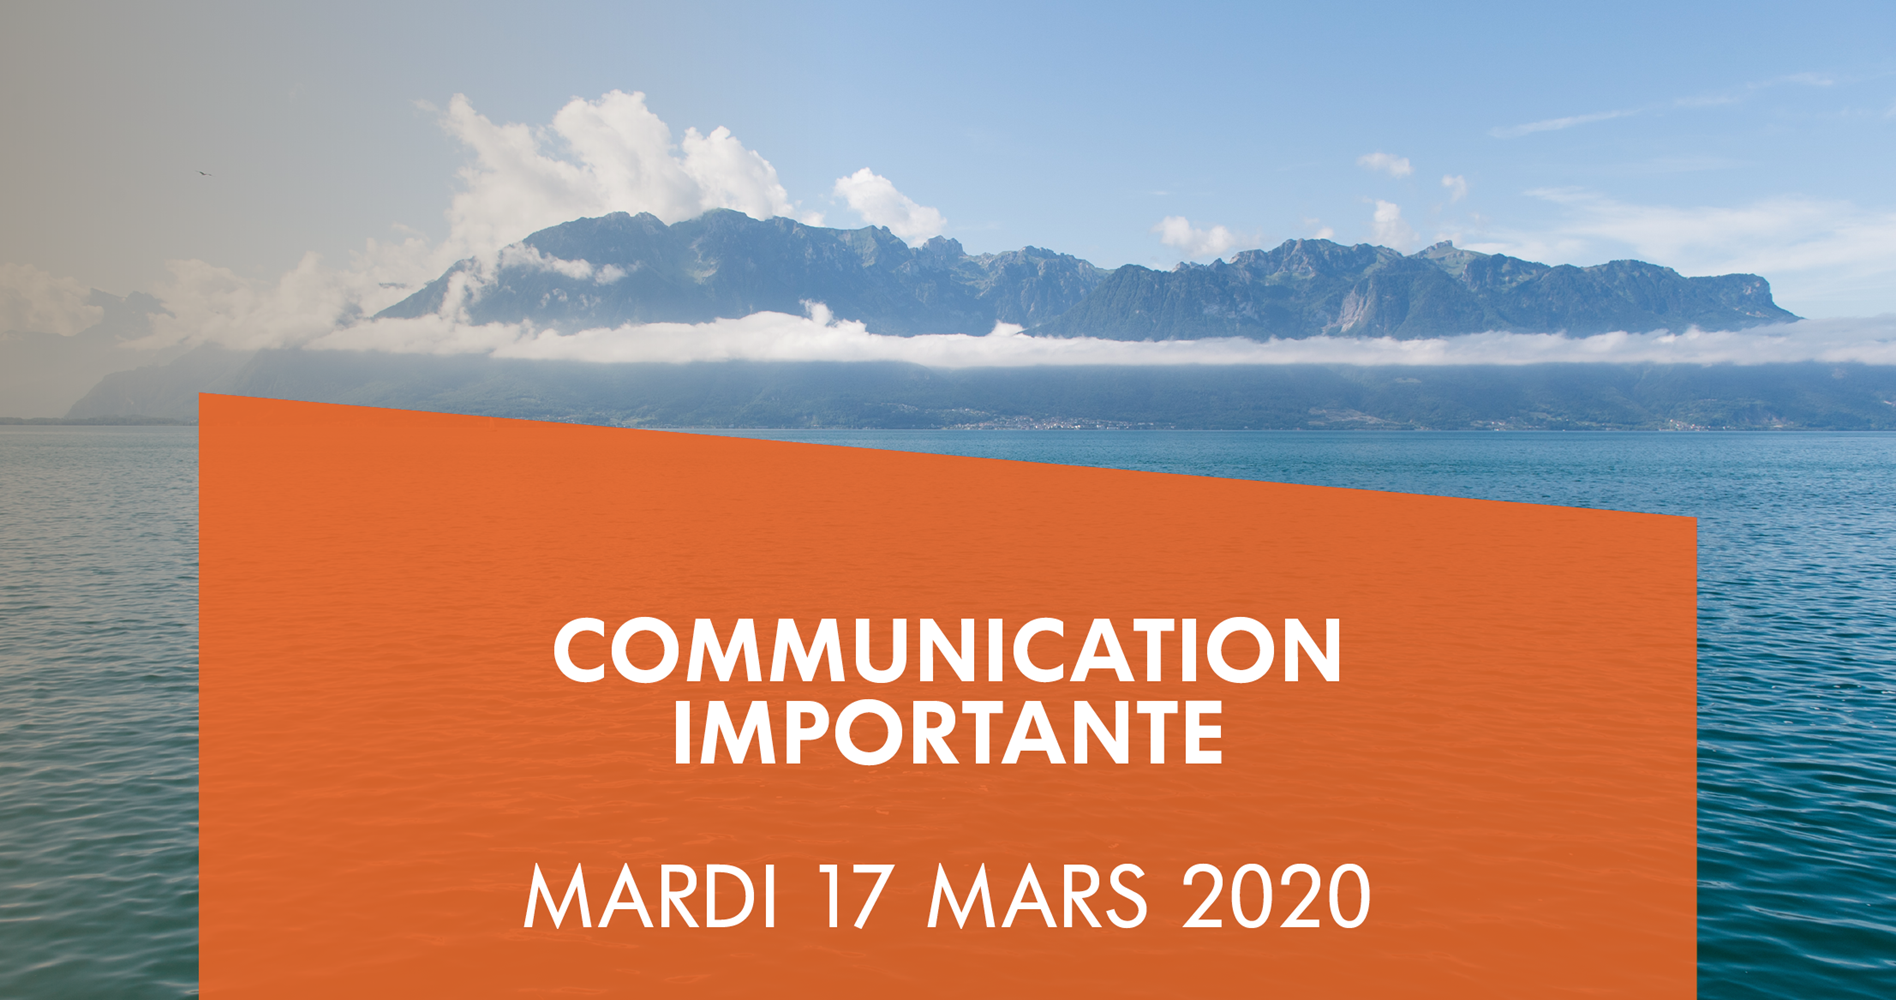 COMMUNICATION IMPORTANTE : COVID-19